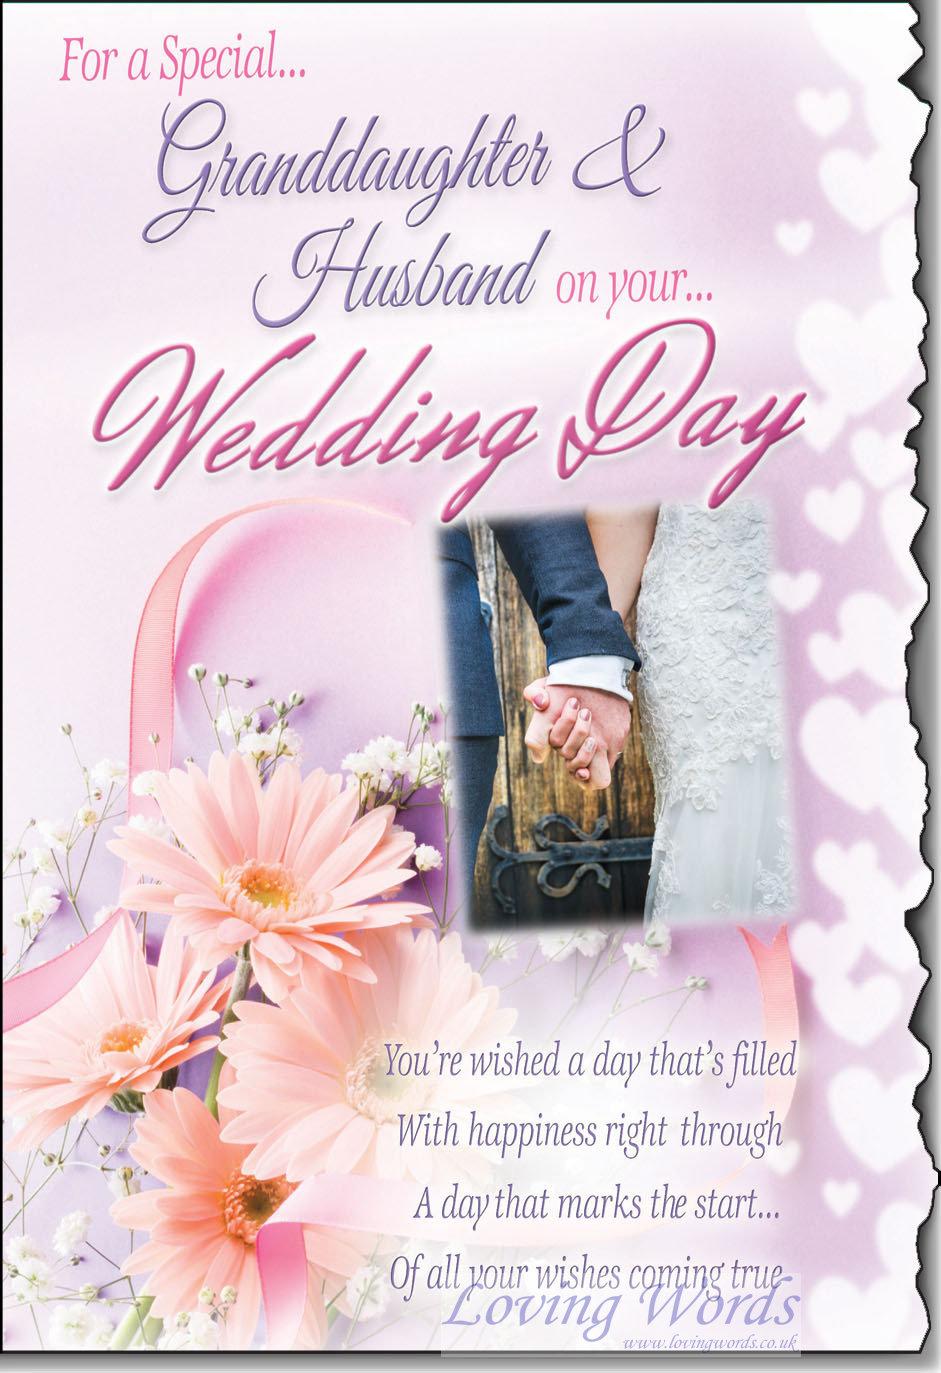 Wedding granddaughter husbandband greeting cards by loving words personalised greeting cards m4hsunfo